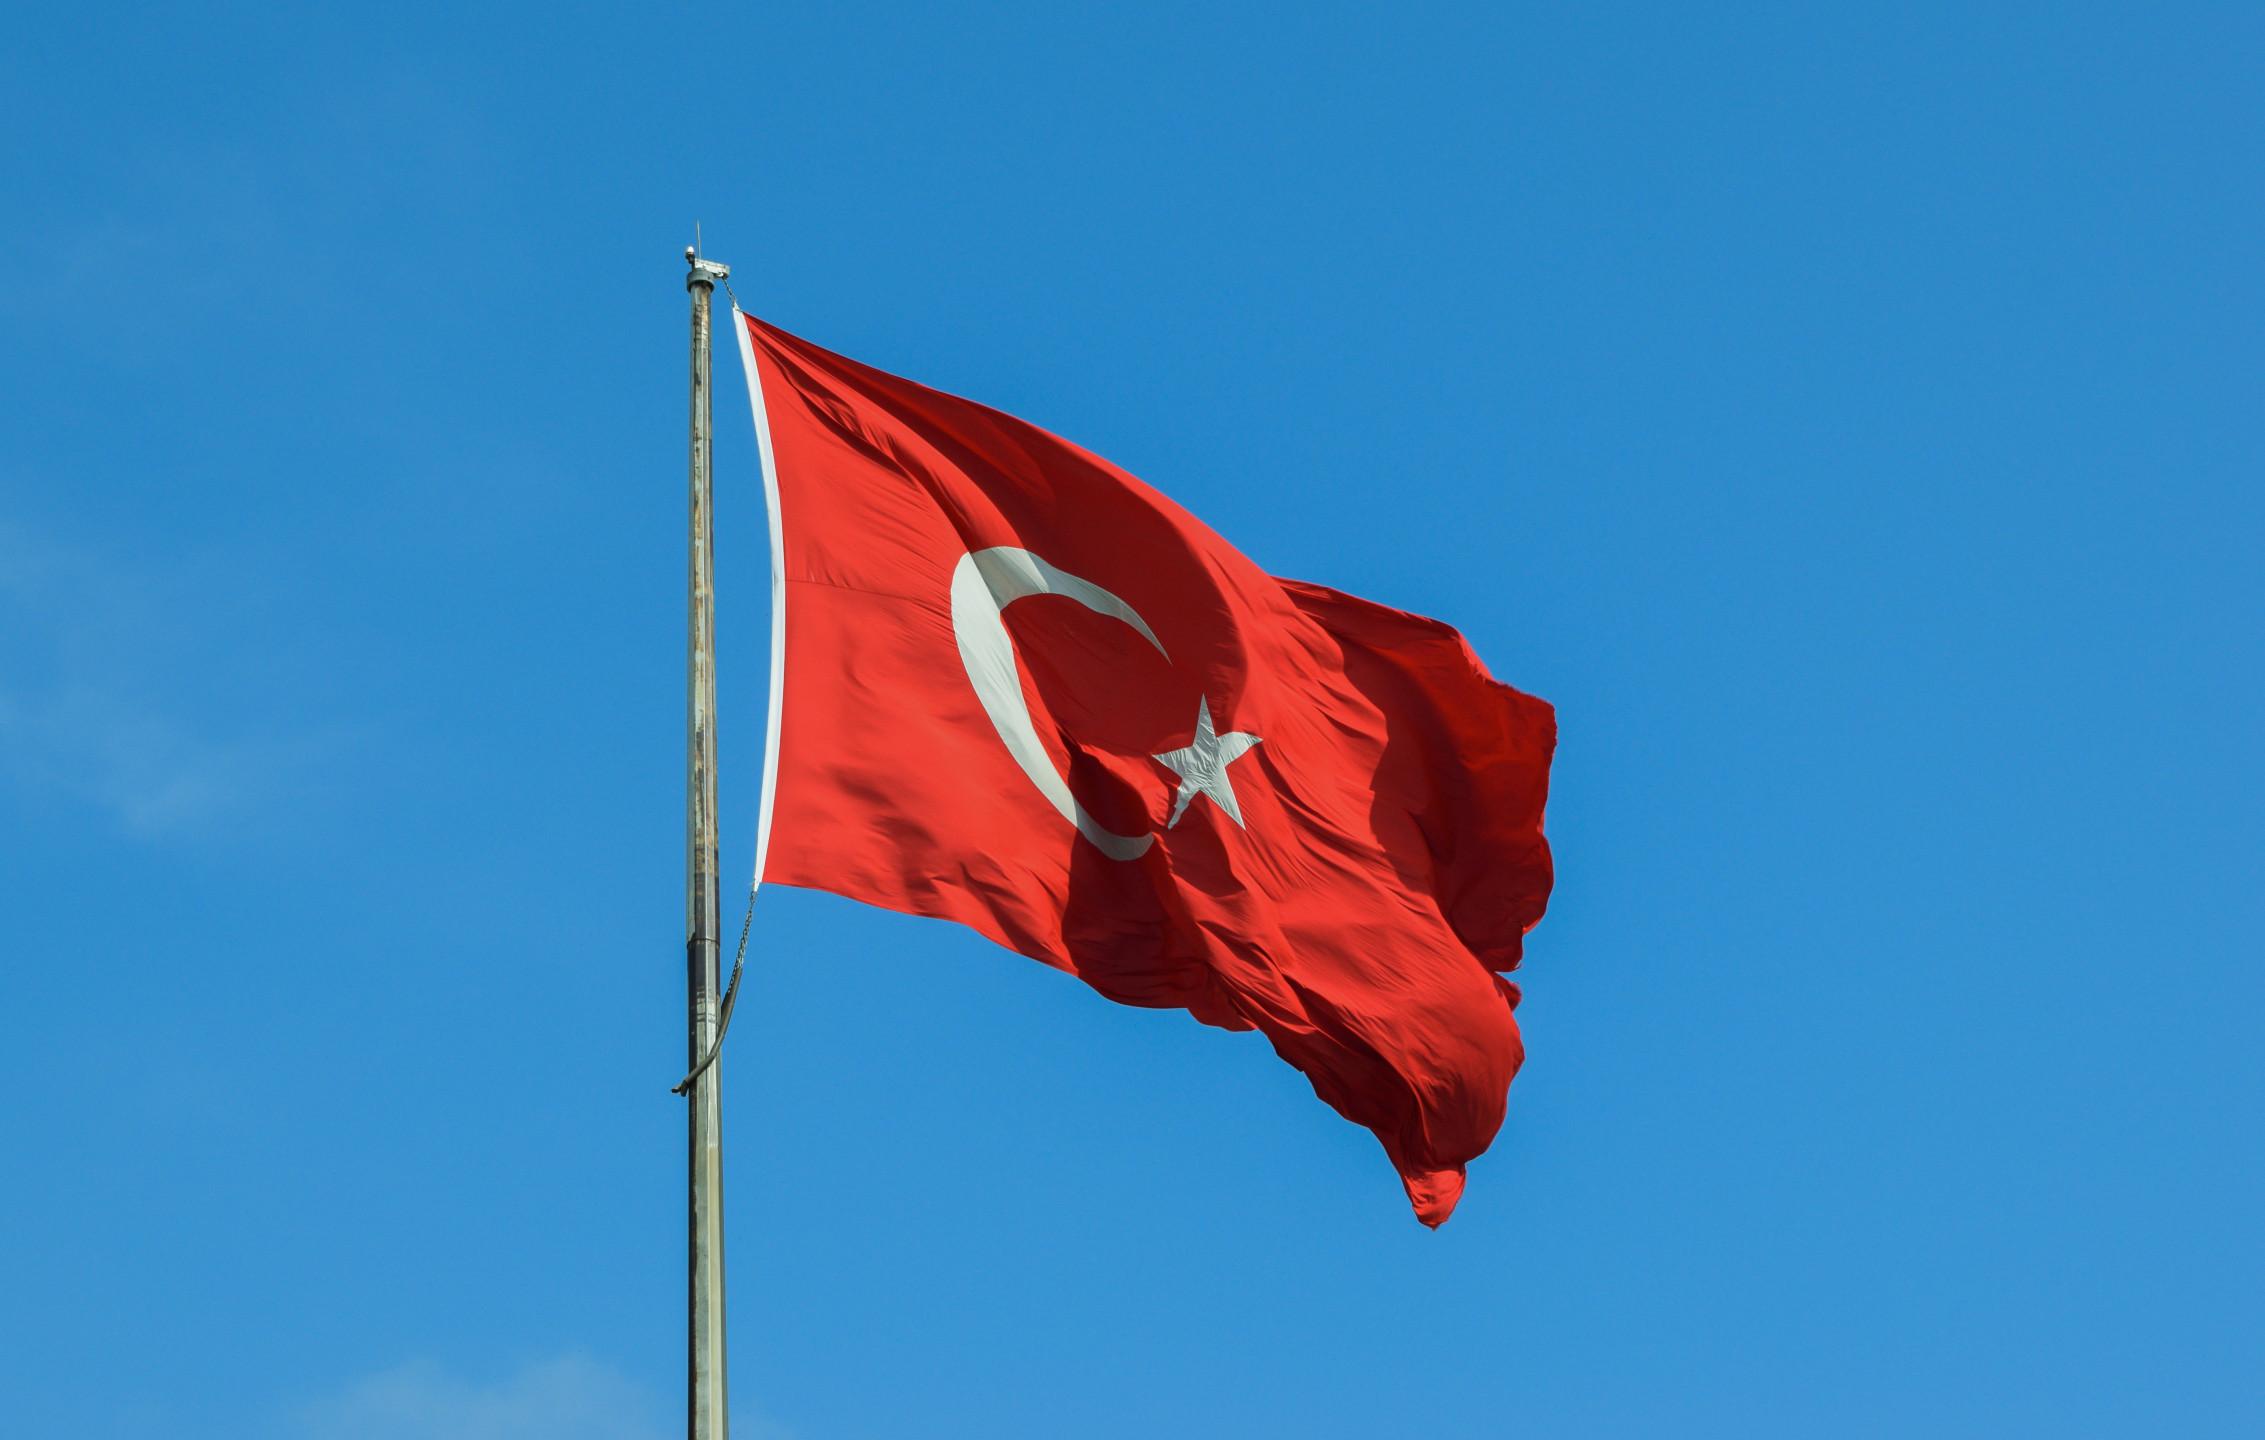 USDTRY analysis - Turkish lira climbs to 4-day tops around 5.57